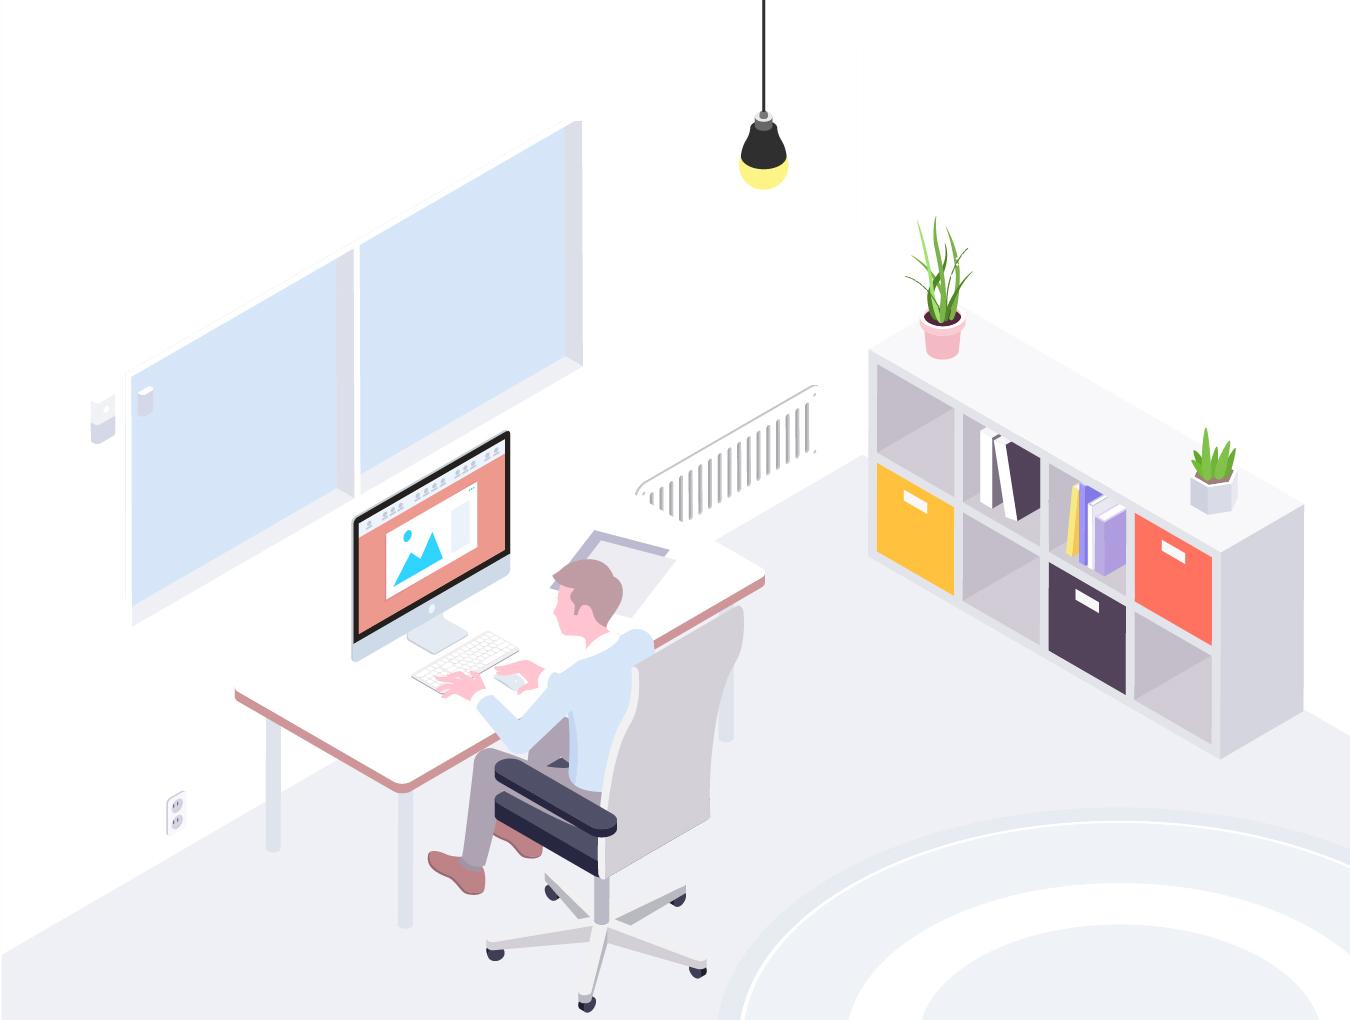 2.5D家居生活智能居家创意场景插画素材 Smartthings Isometric